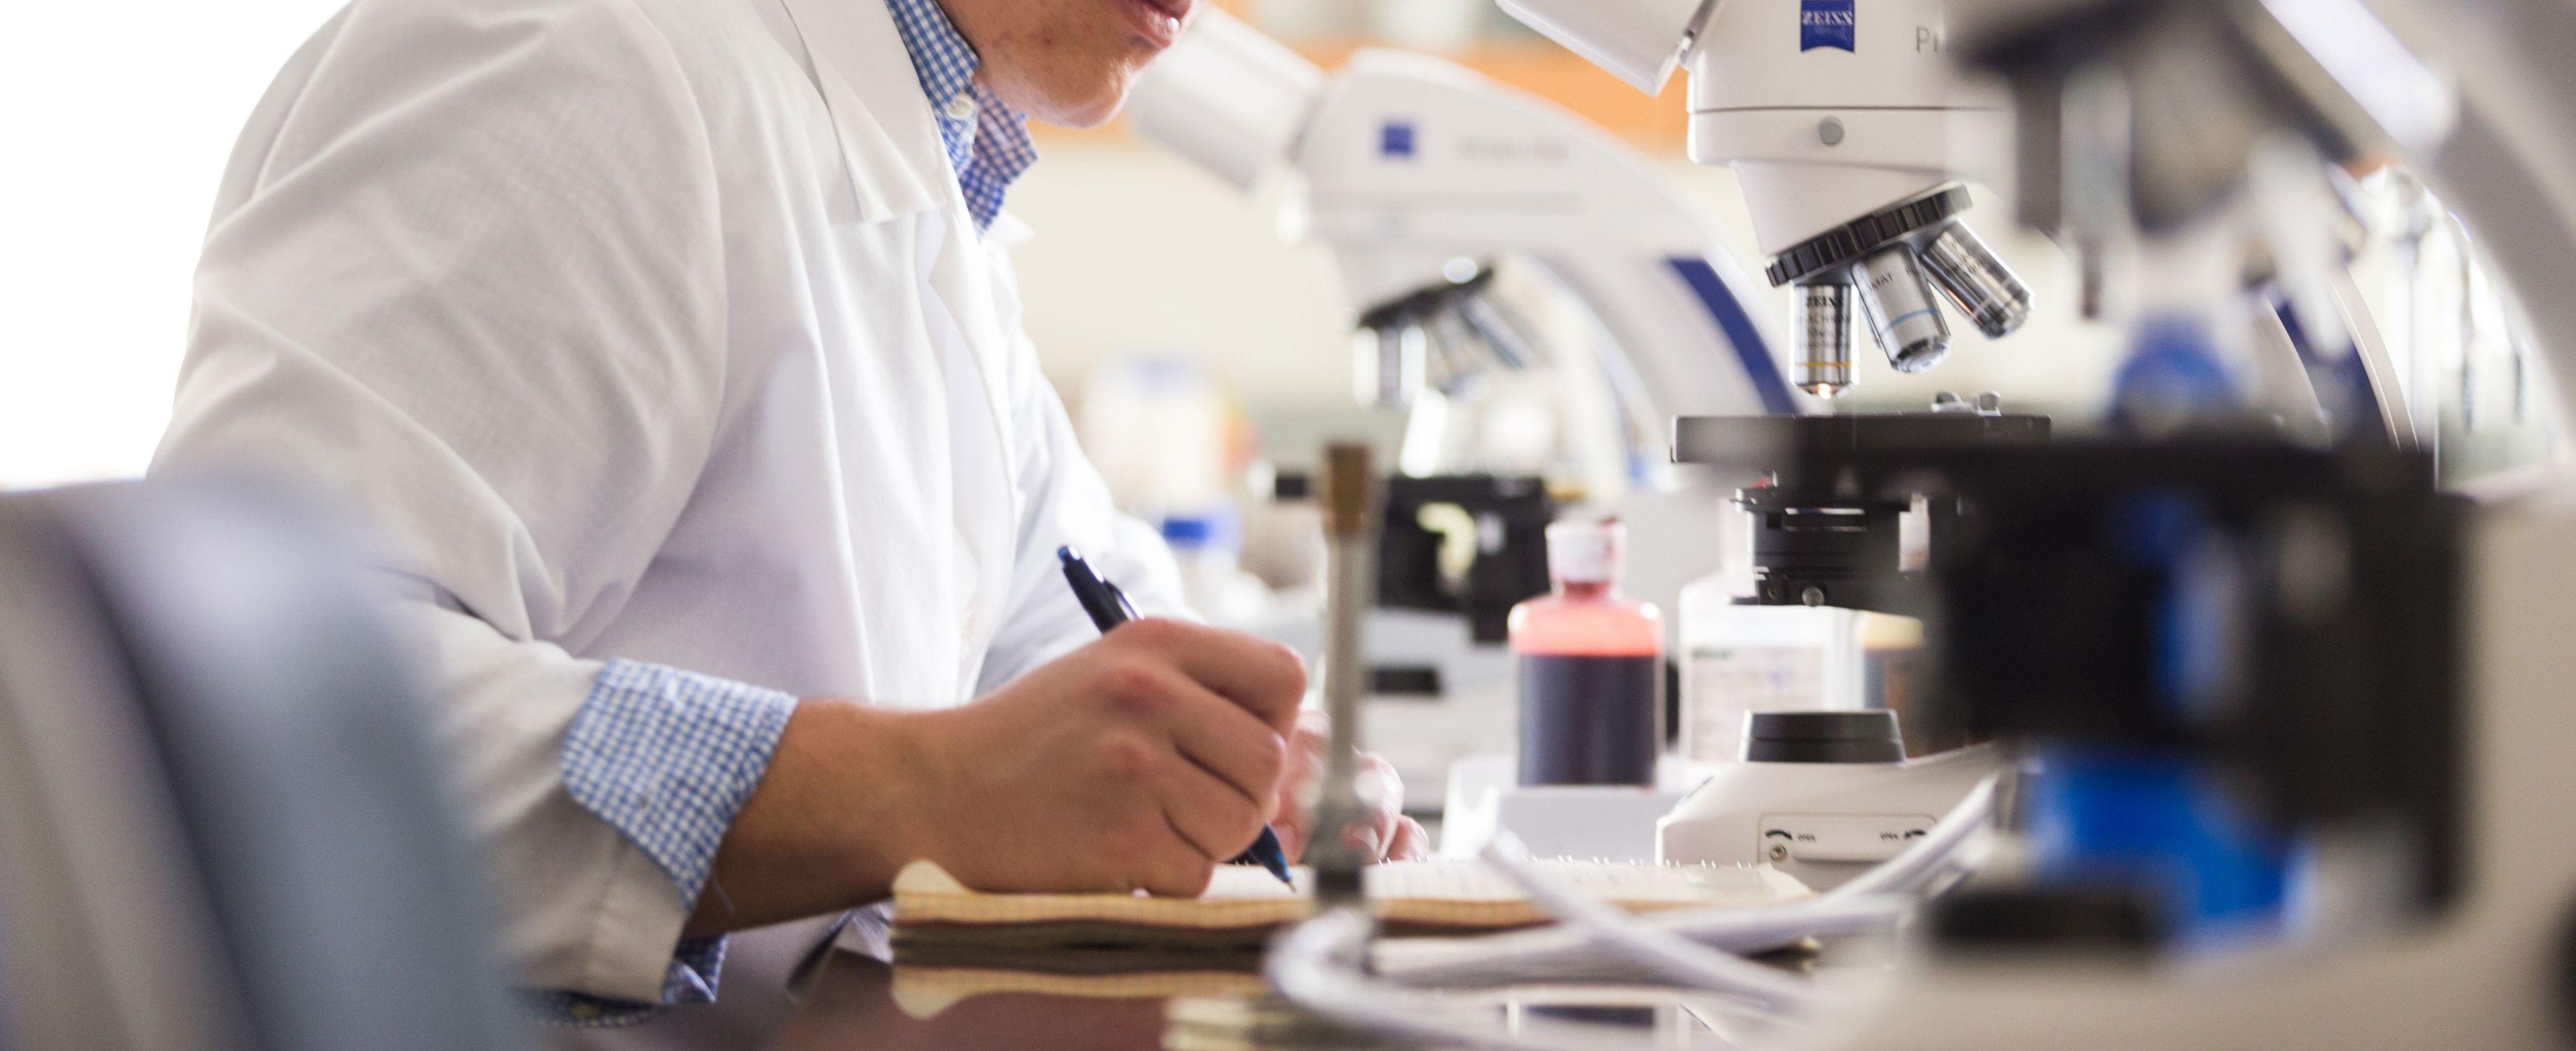 Bachelors Degree Biochemistry And Molecular Biology